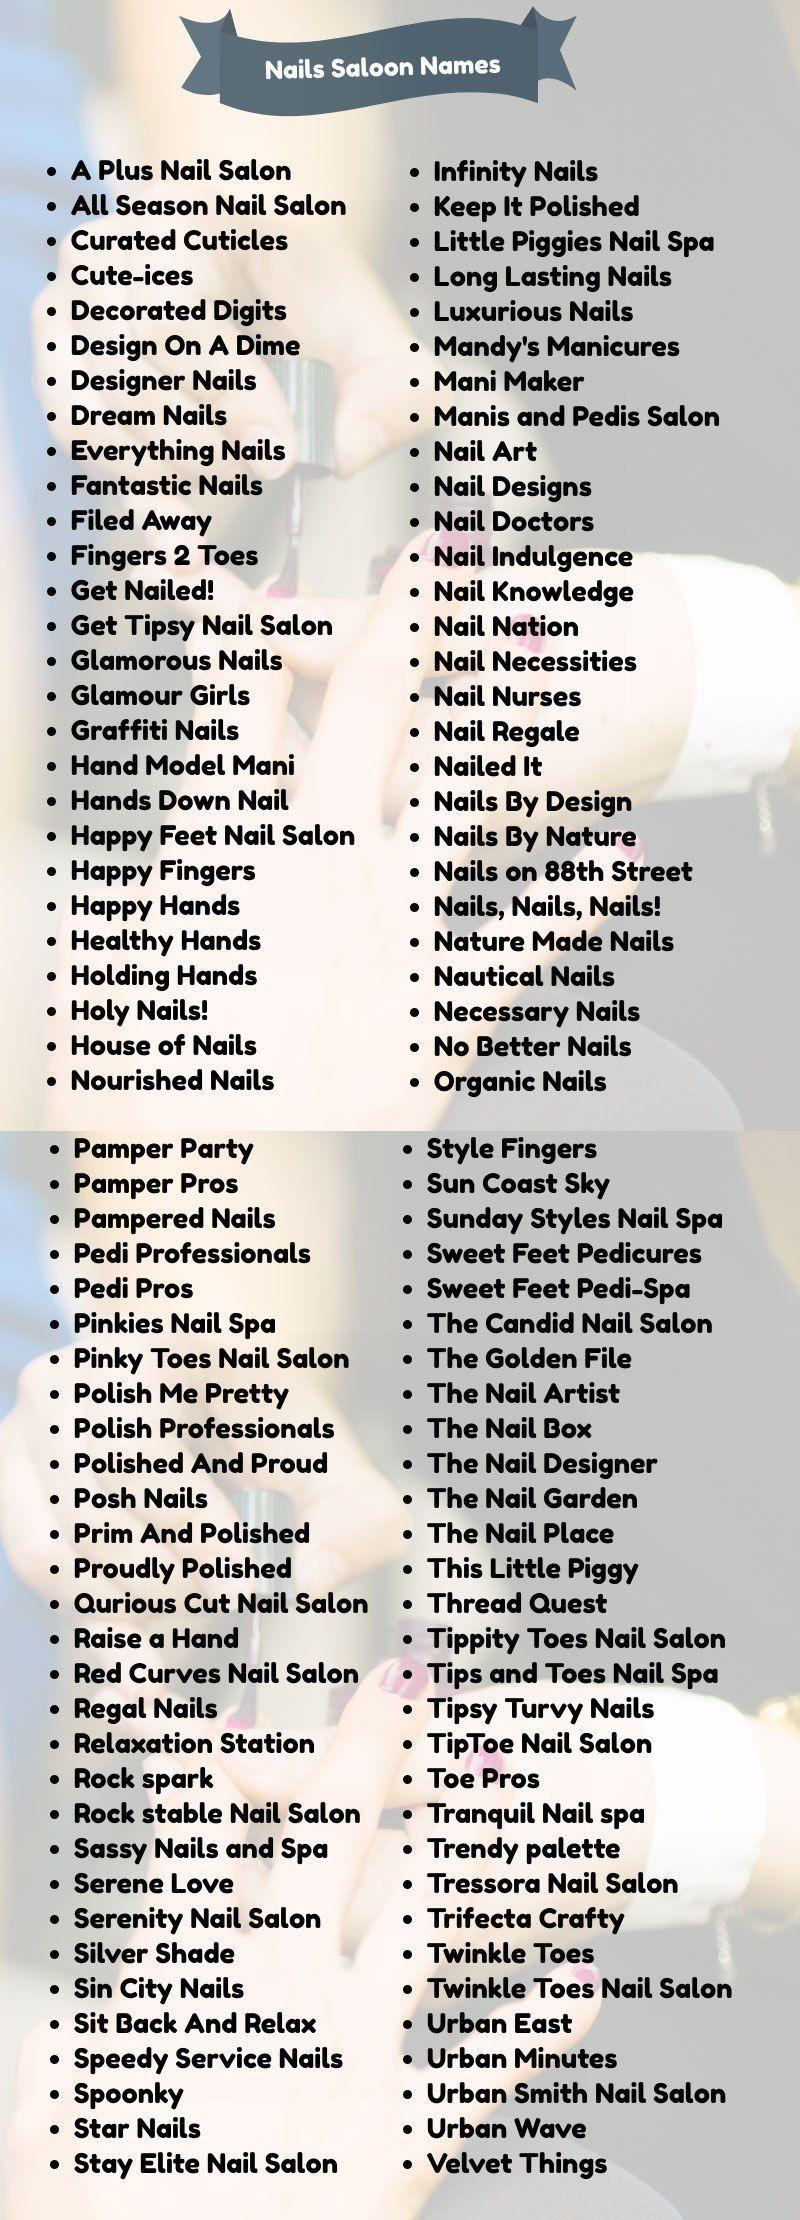 lash names for business ideas 400 Classy Nail Salon Names